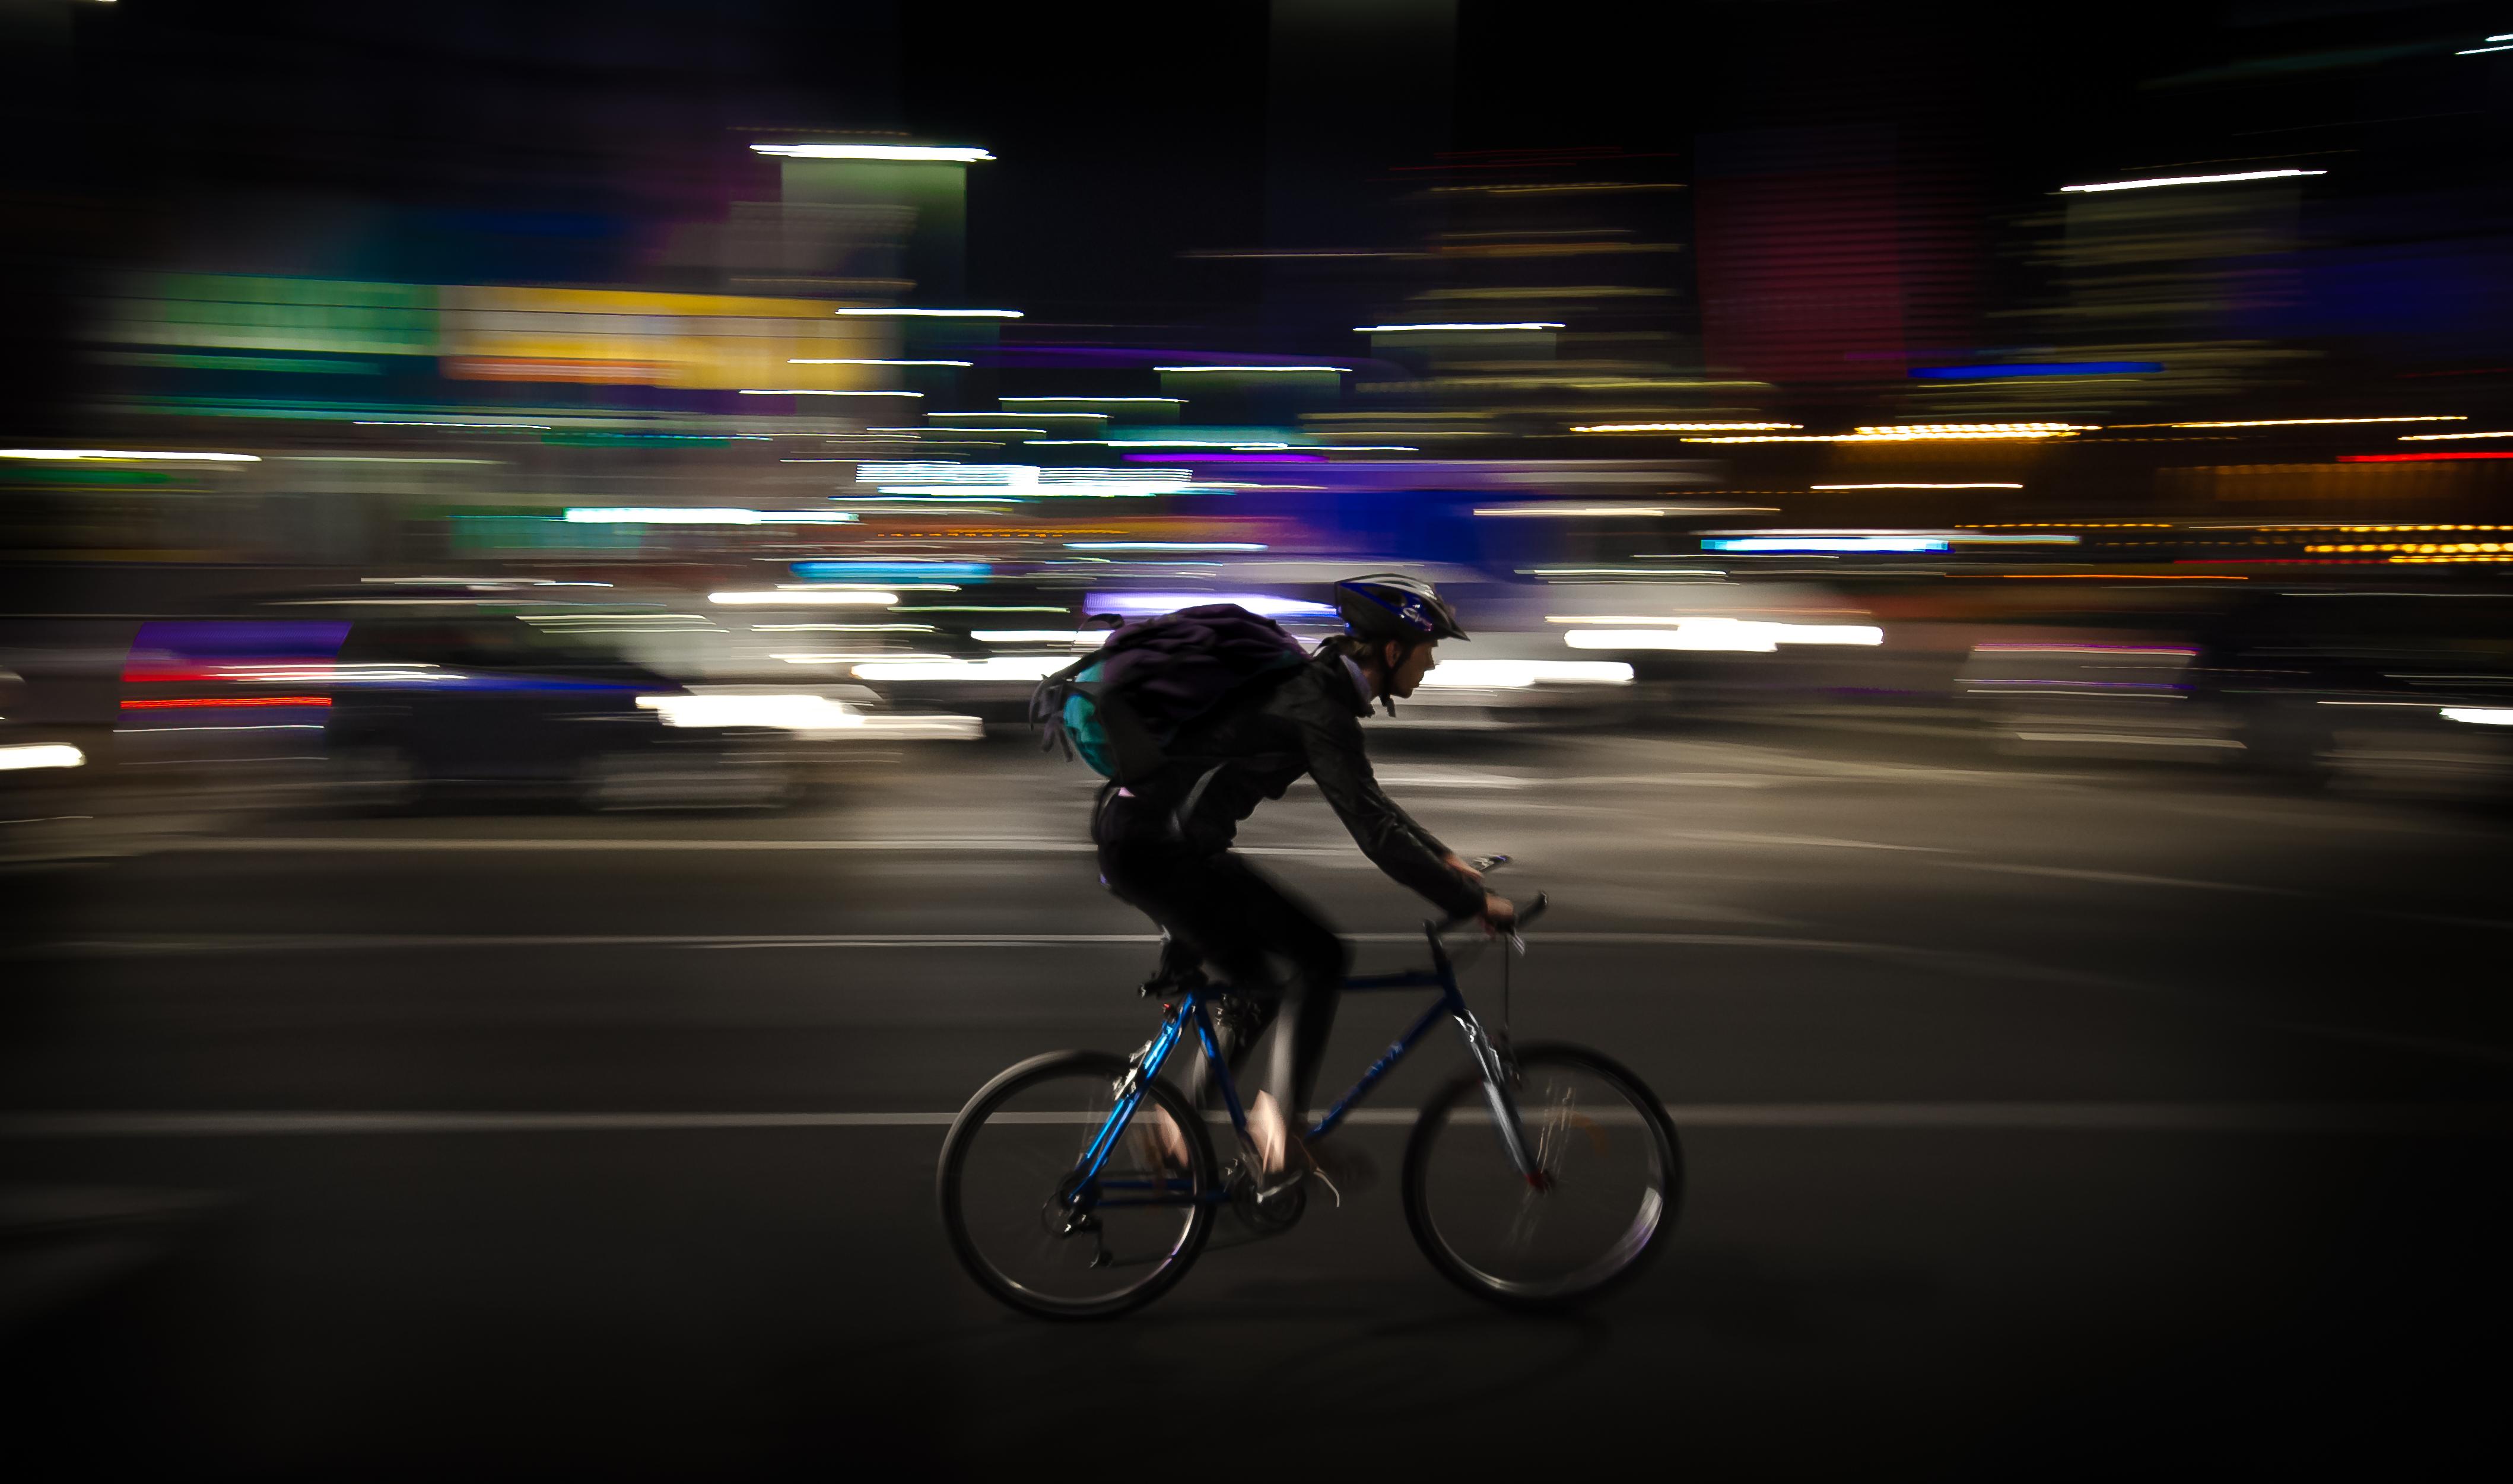 tienda marbella bike